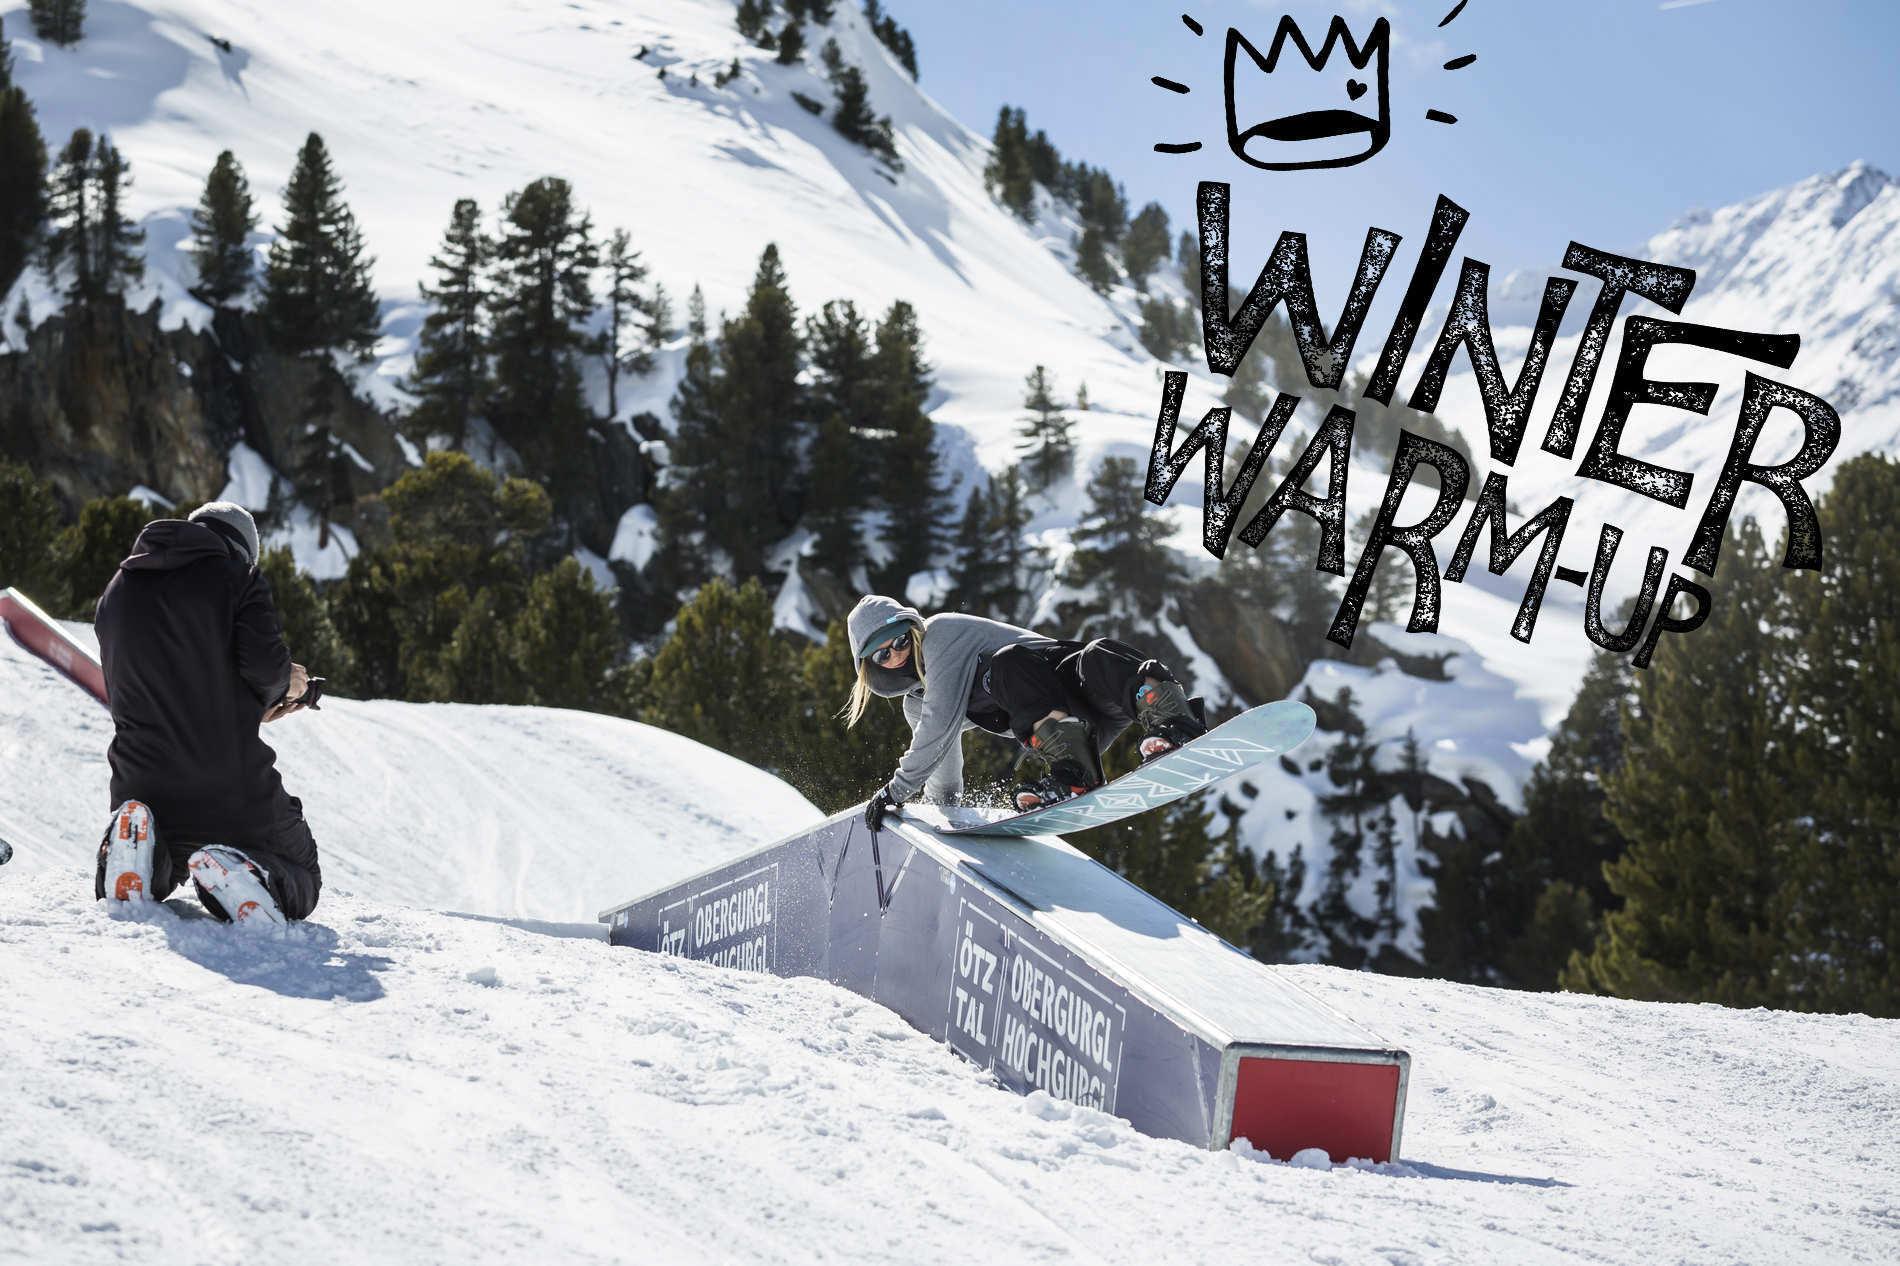 1 winter warm up videos kopie